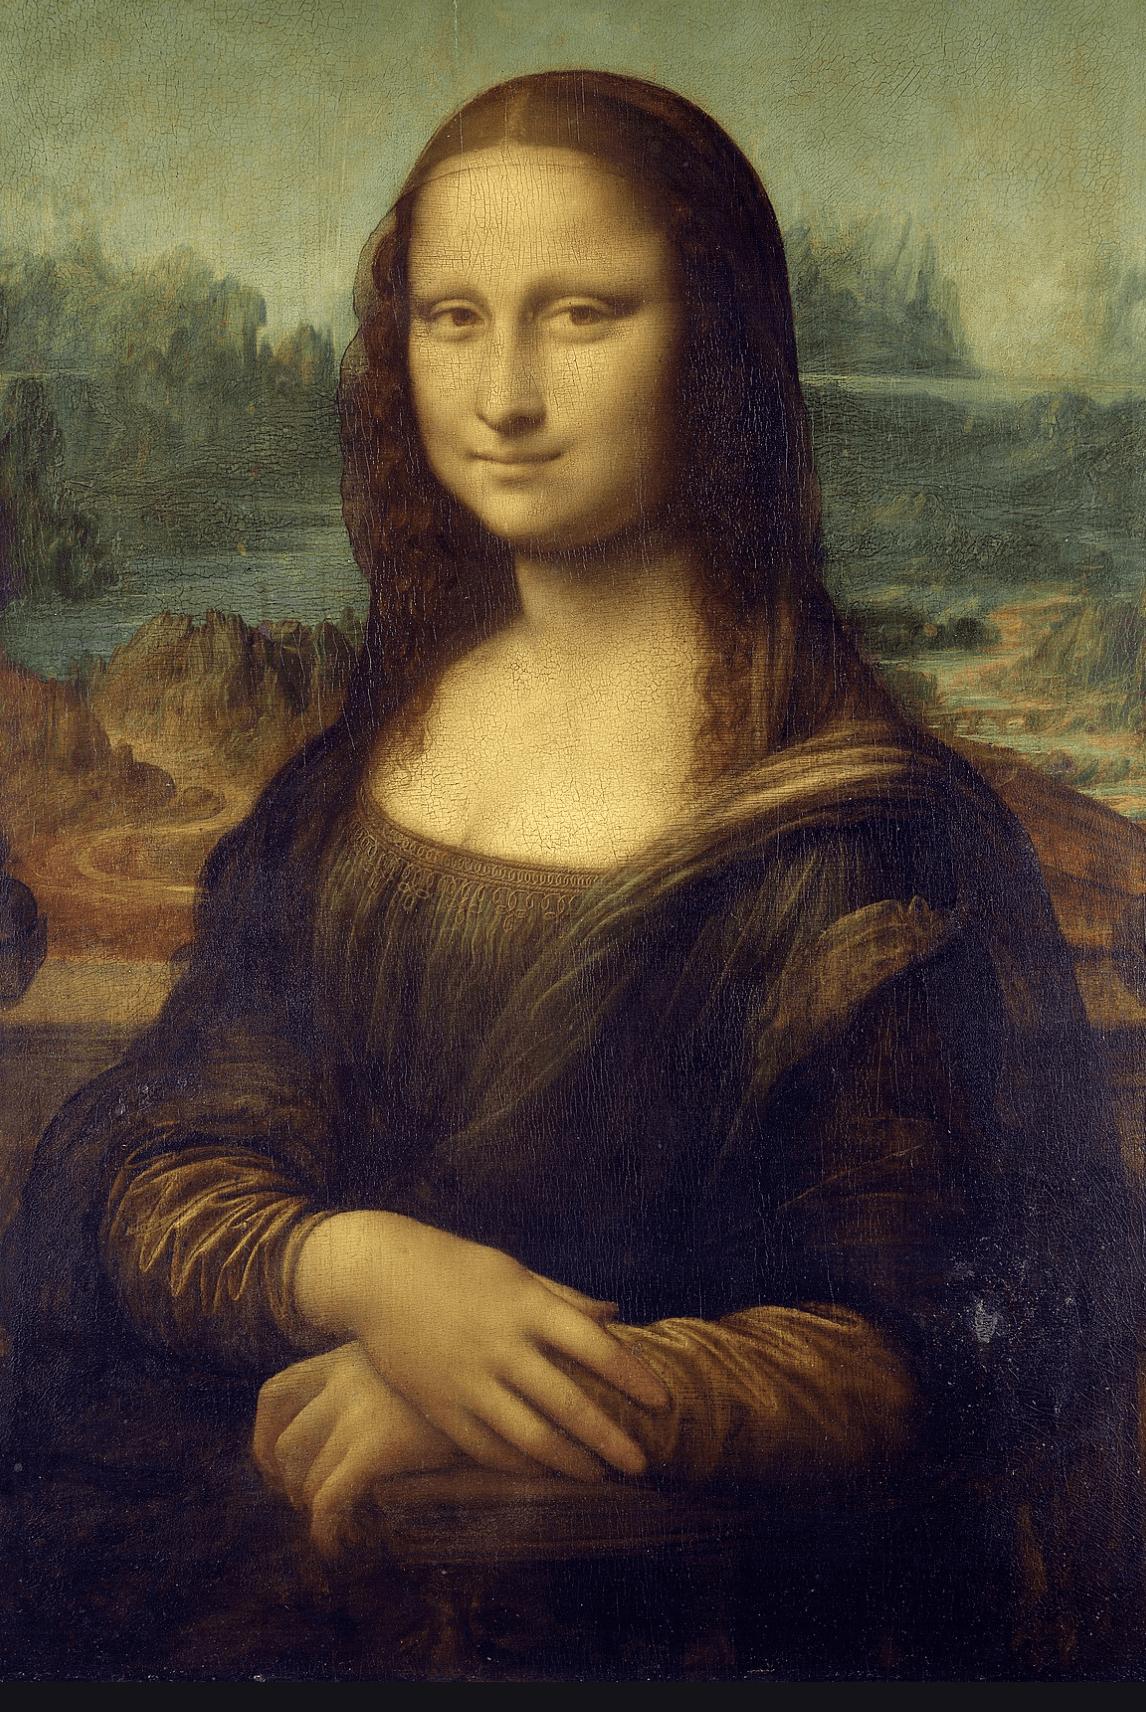 Mona Lisa - Leonardo Da-Vinci  - Lasting Impressions